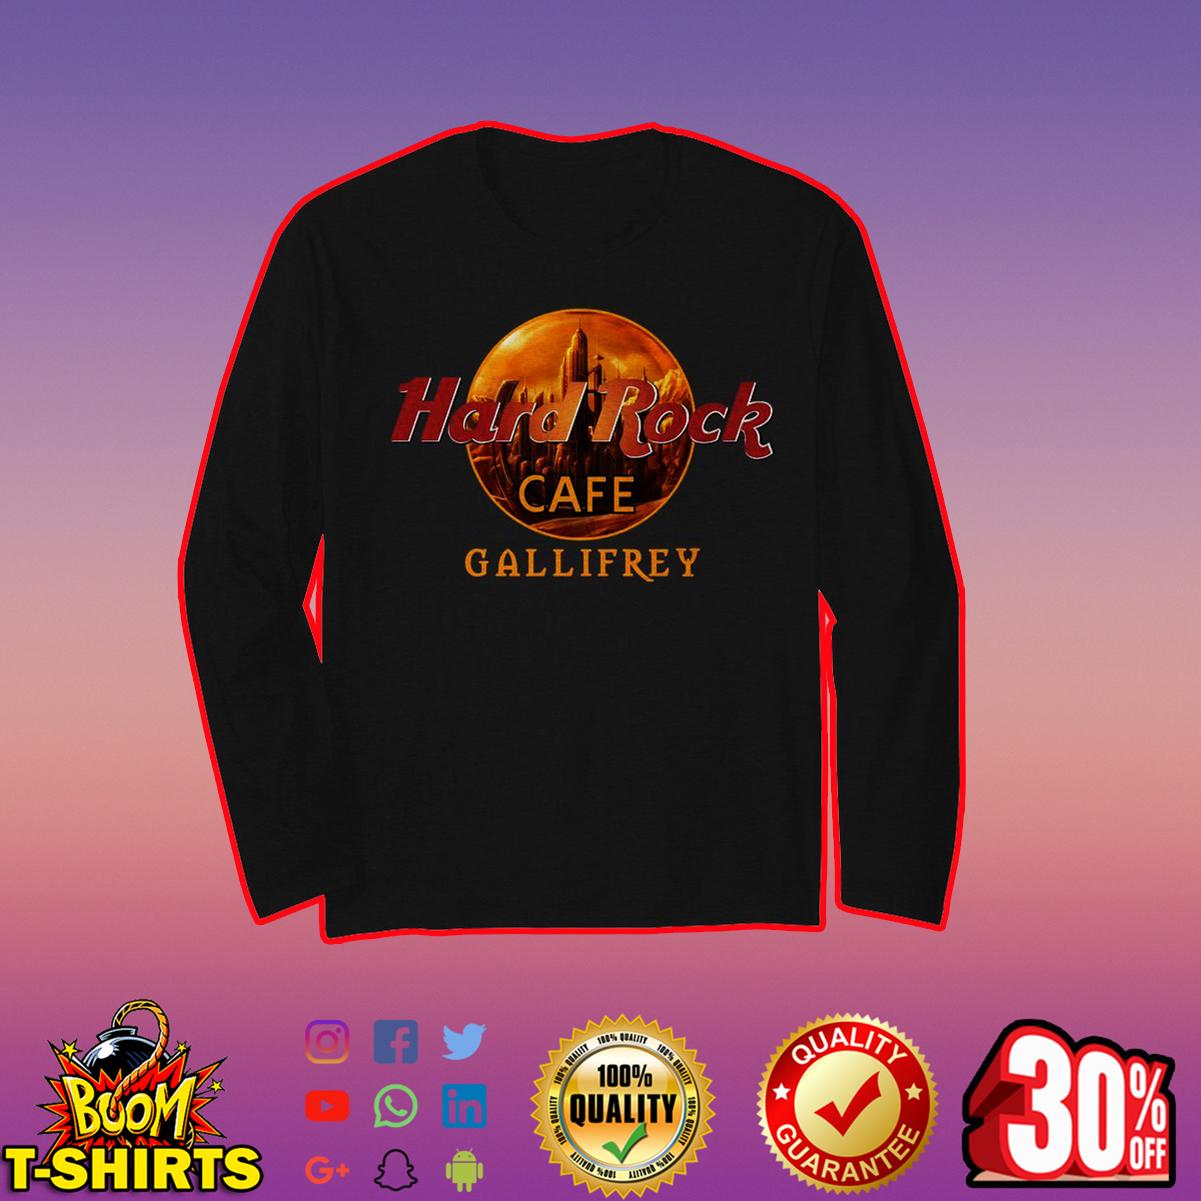 Hard Rock cafe Gallifrey long sleeve t-shirt